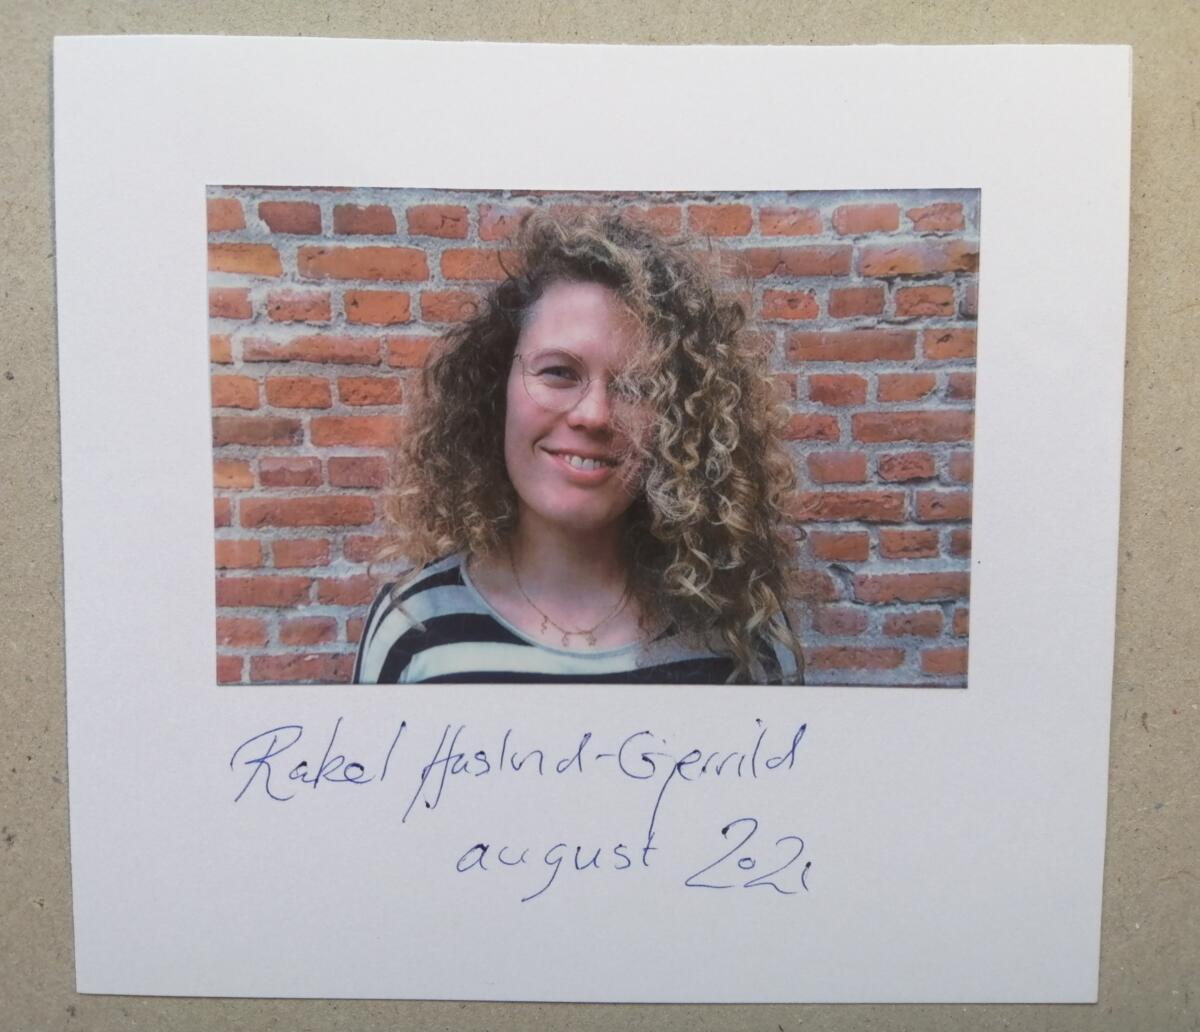 08-21-Rakel-Haslund-Gjerrild